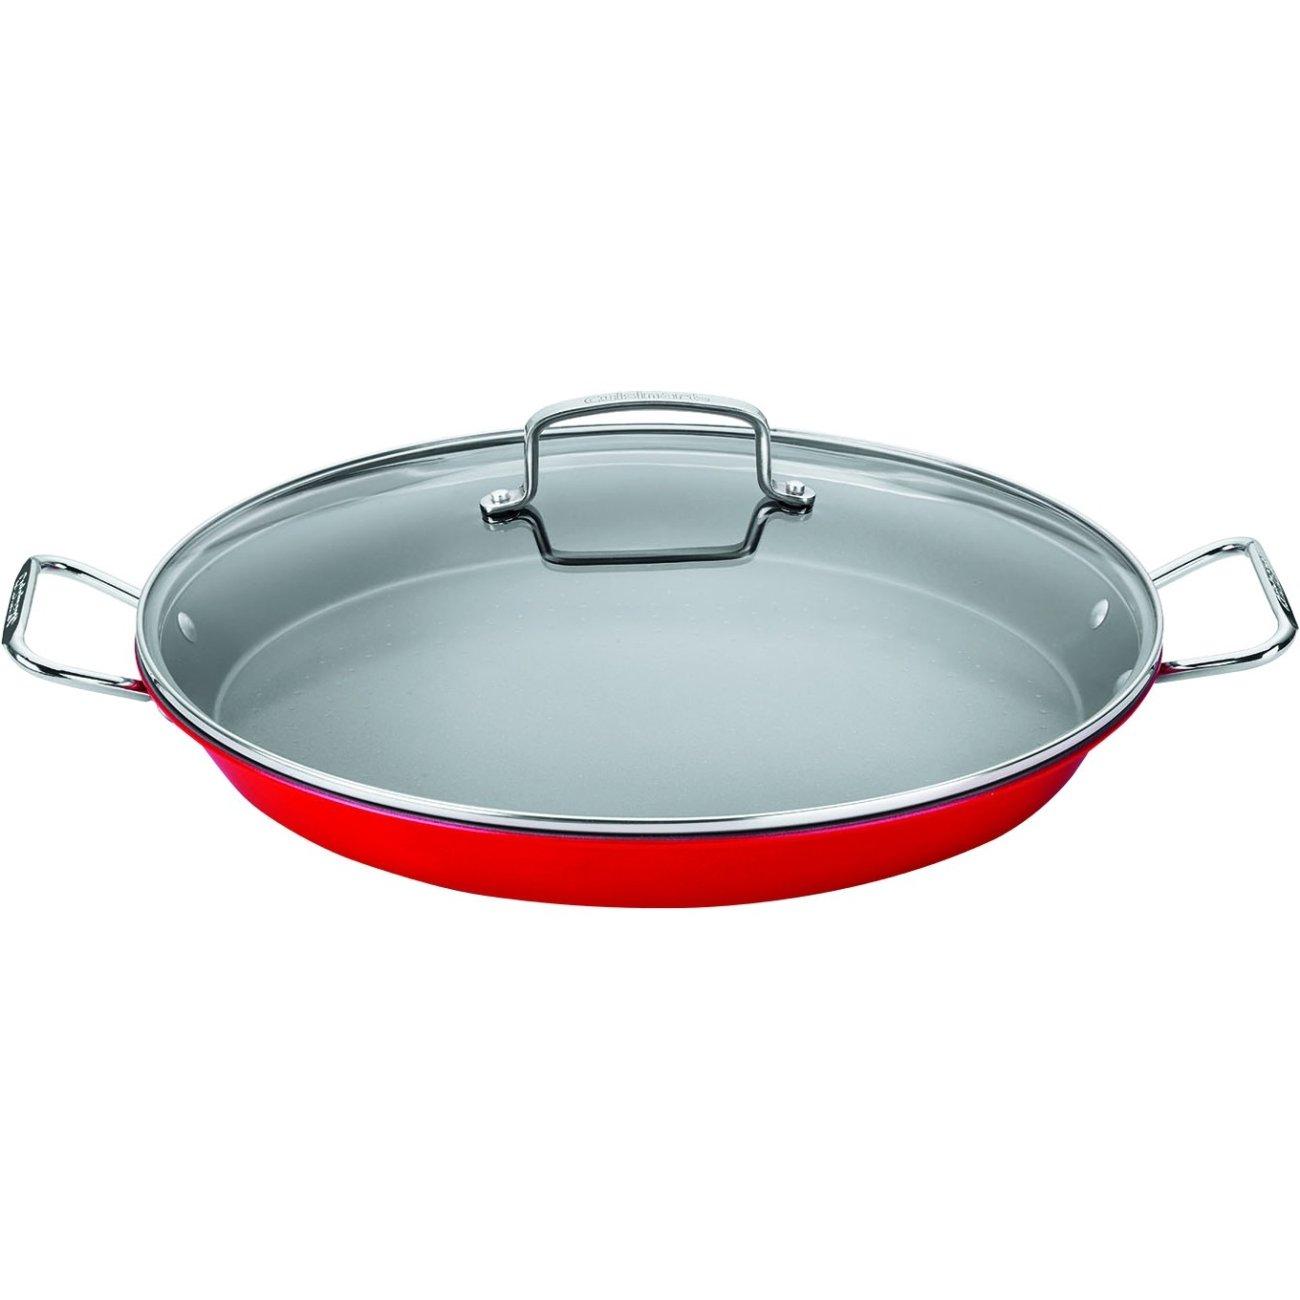 Cuisinart ASP-38CR Non-Stick Paella Pan, 15